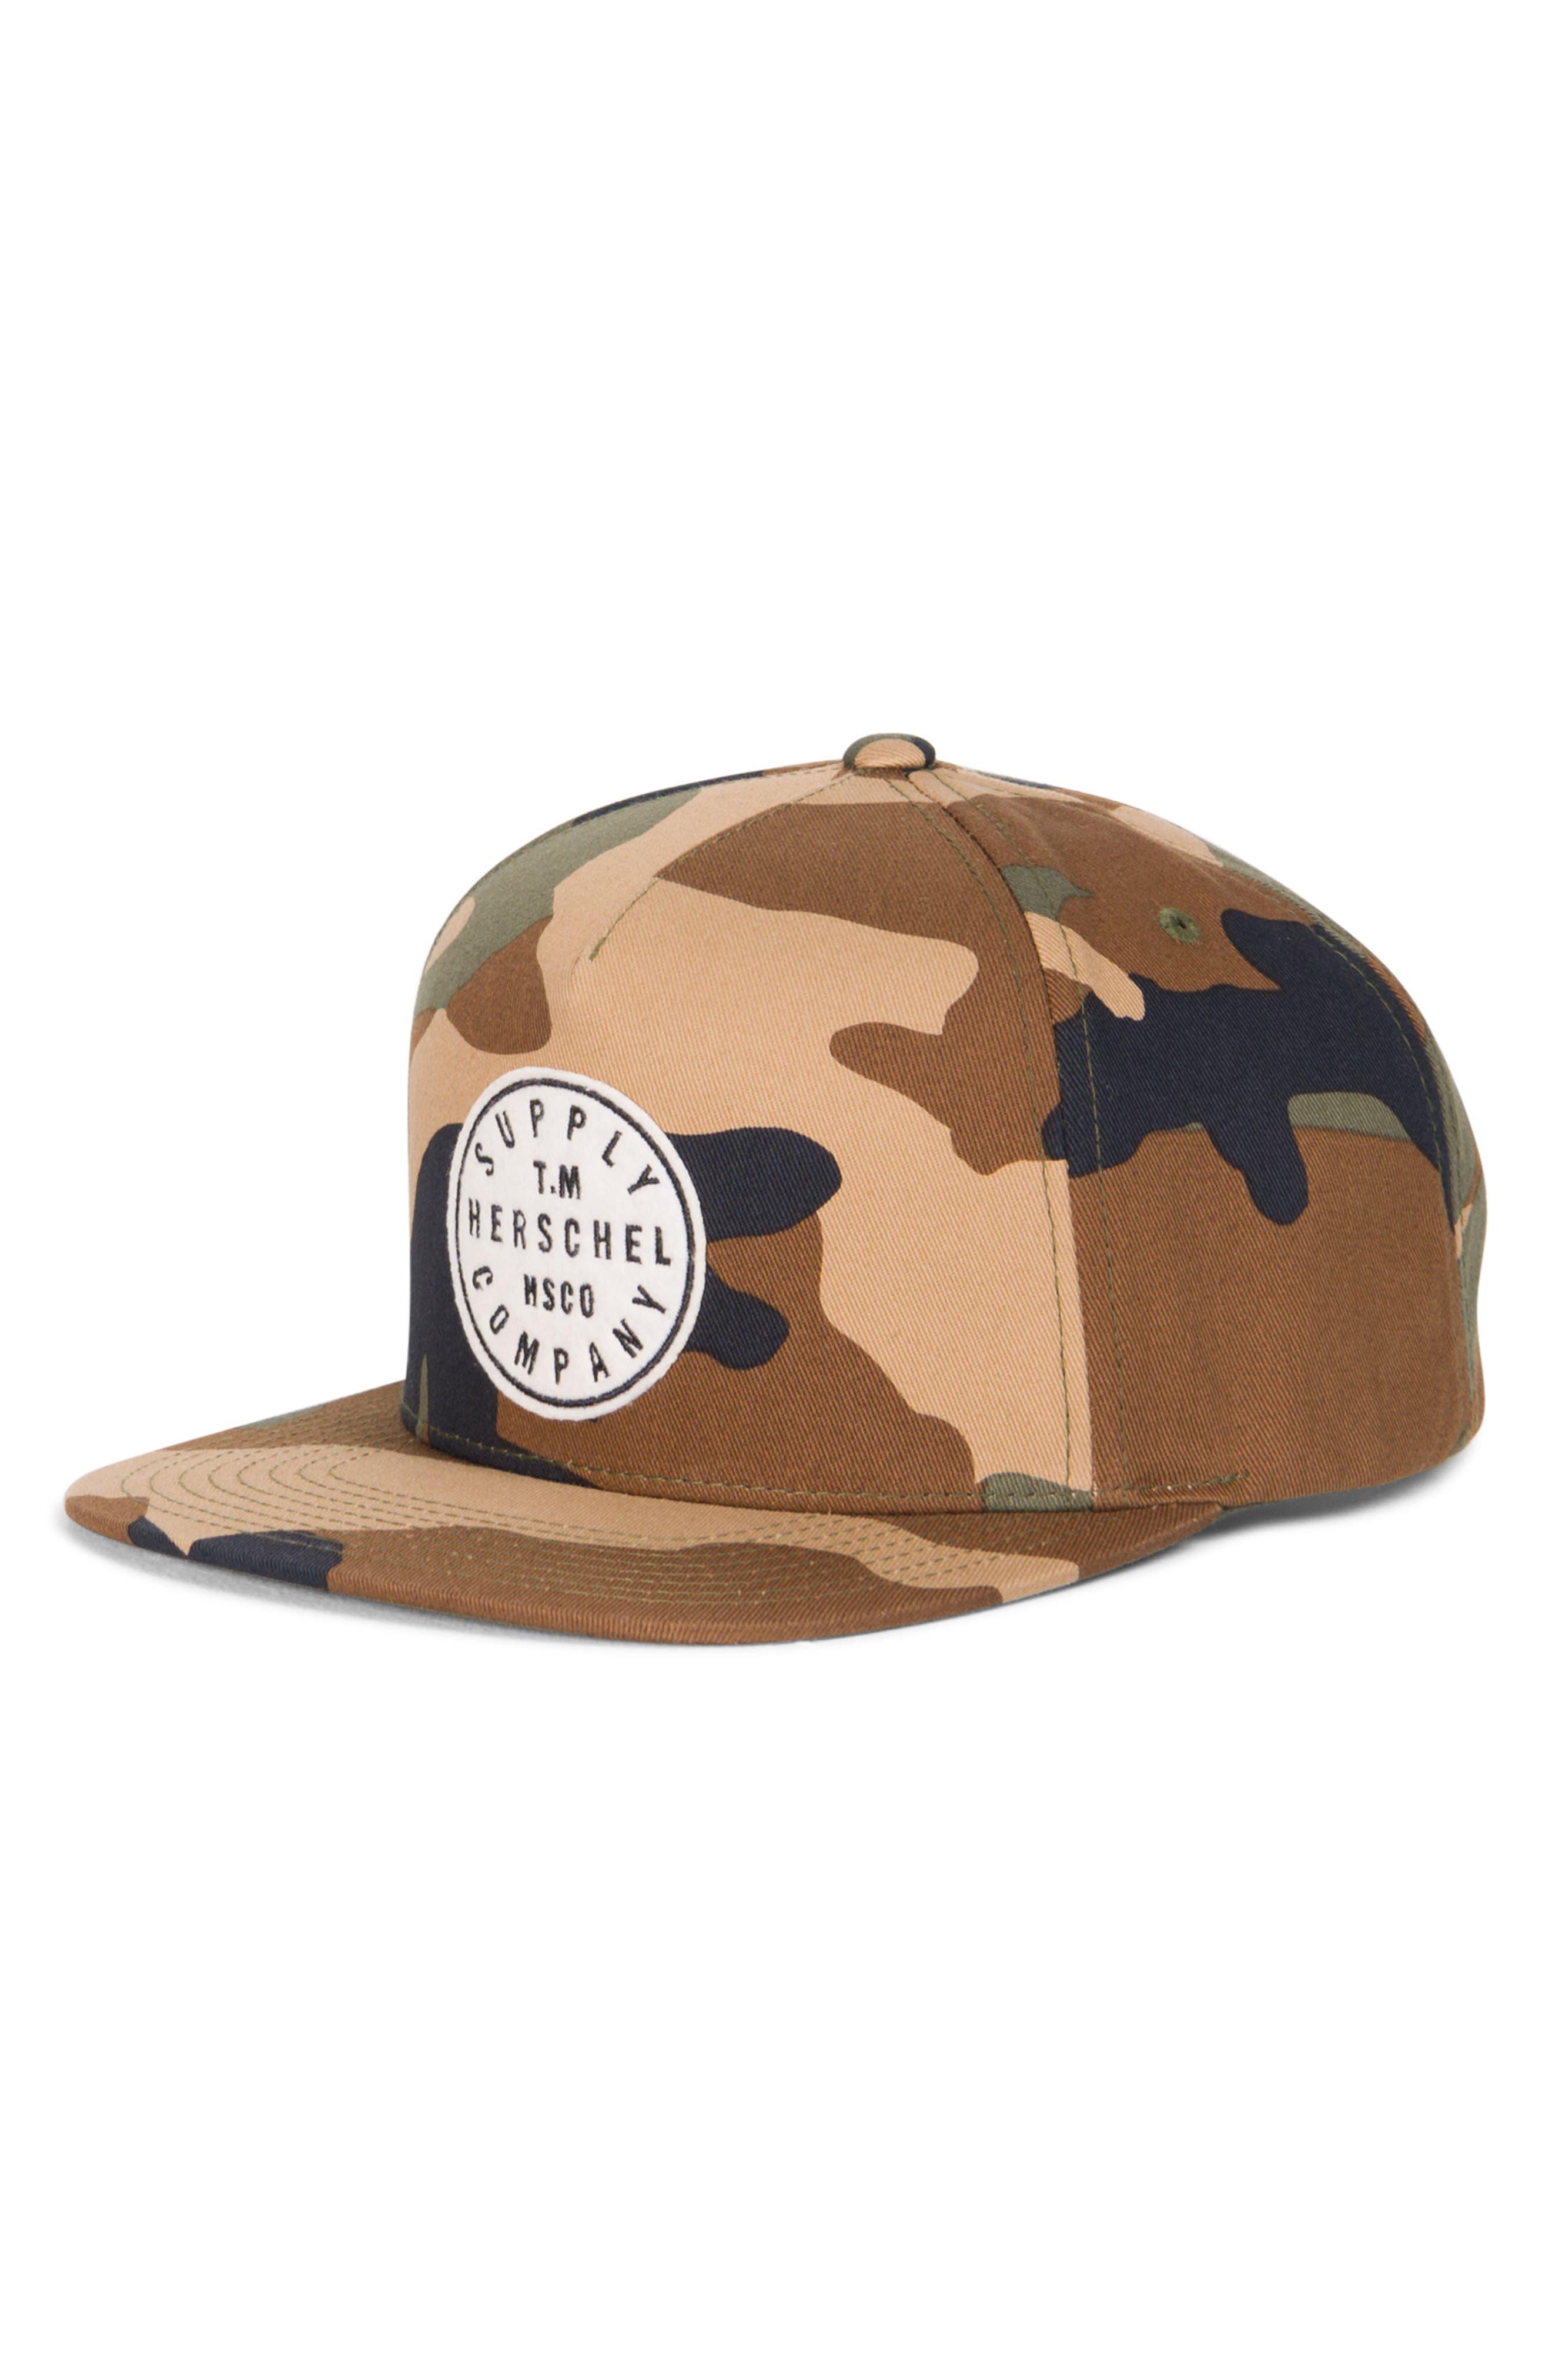 Herschel Supply Co. Camo Snapback Baseball Cap